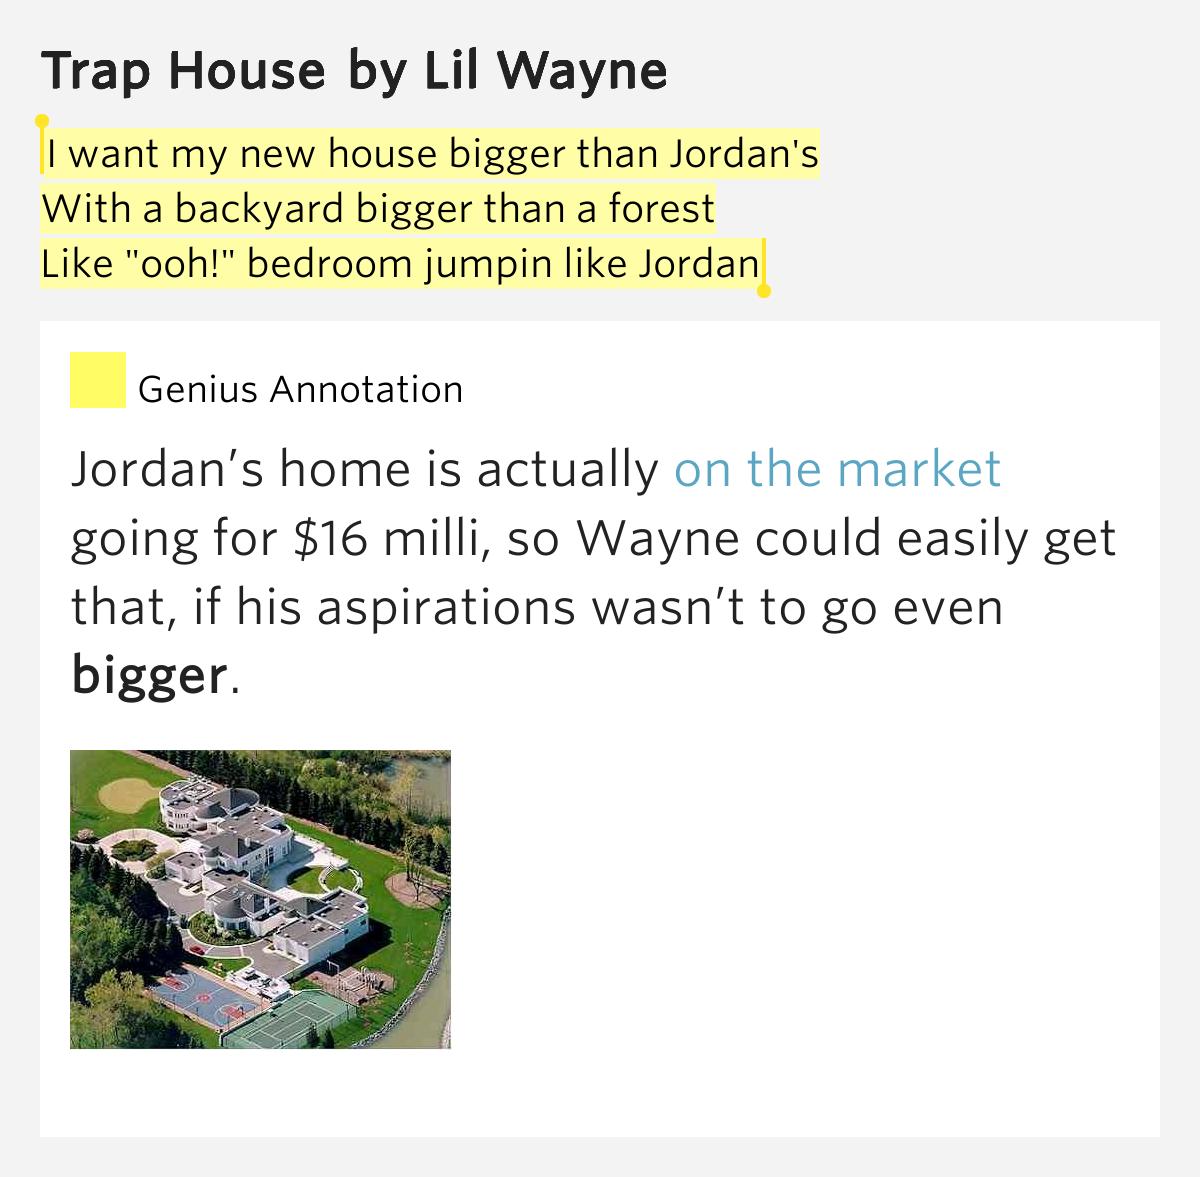 Backyard Lyrics: I Want My New House Bigger Than Jordan's / With A Backyard